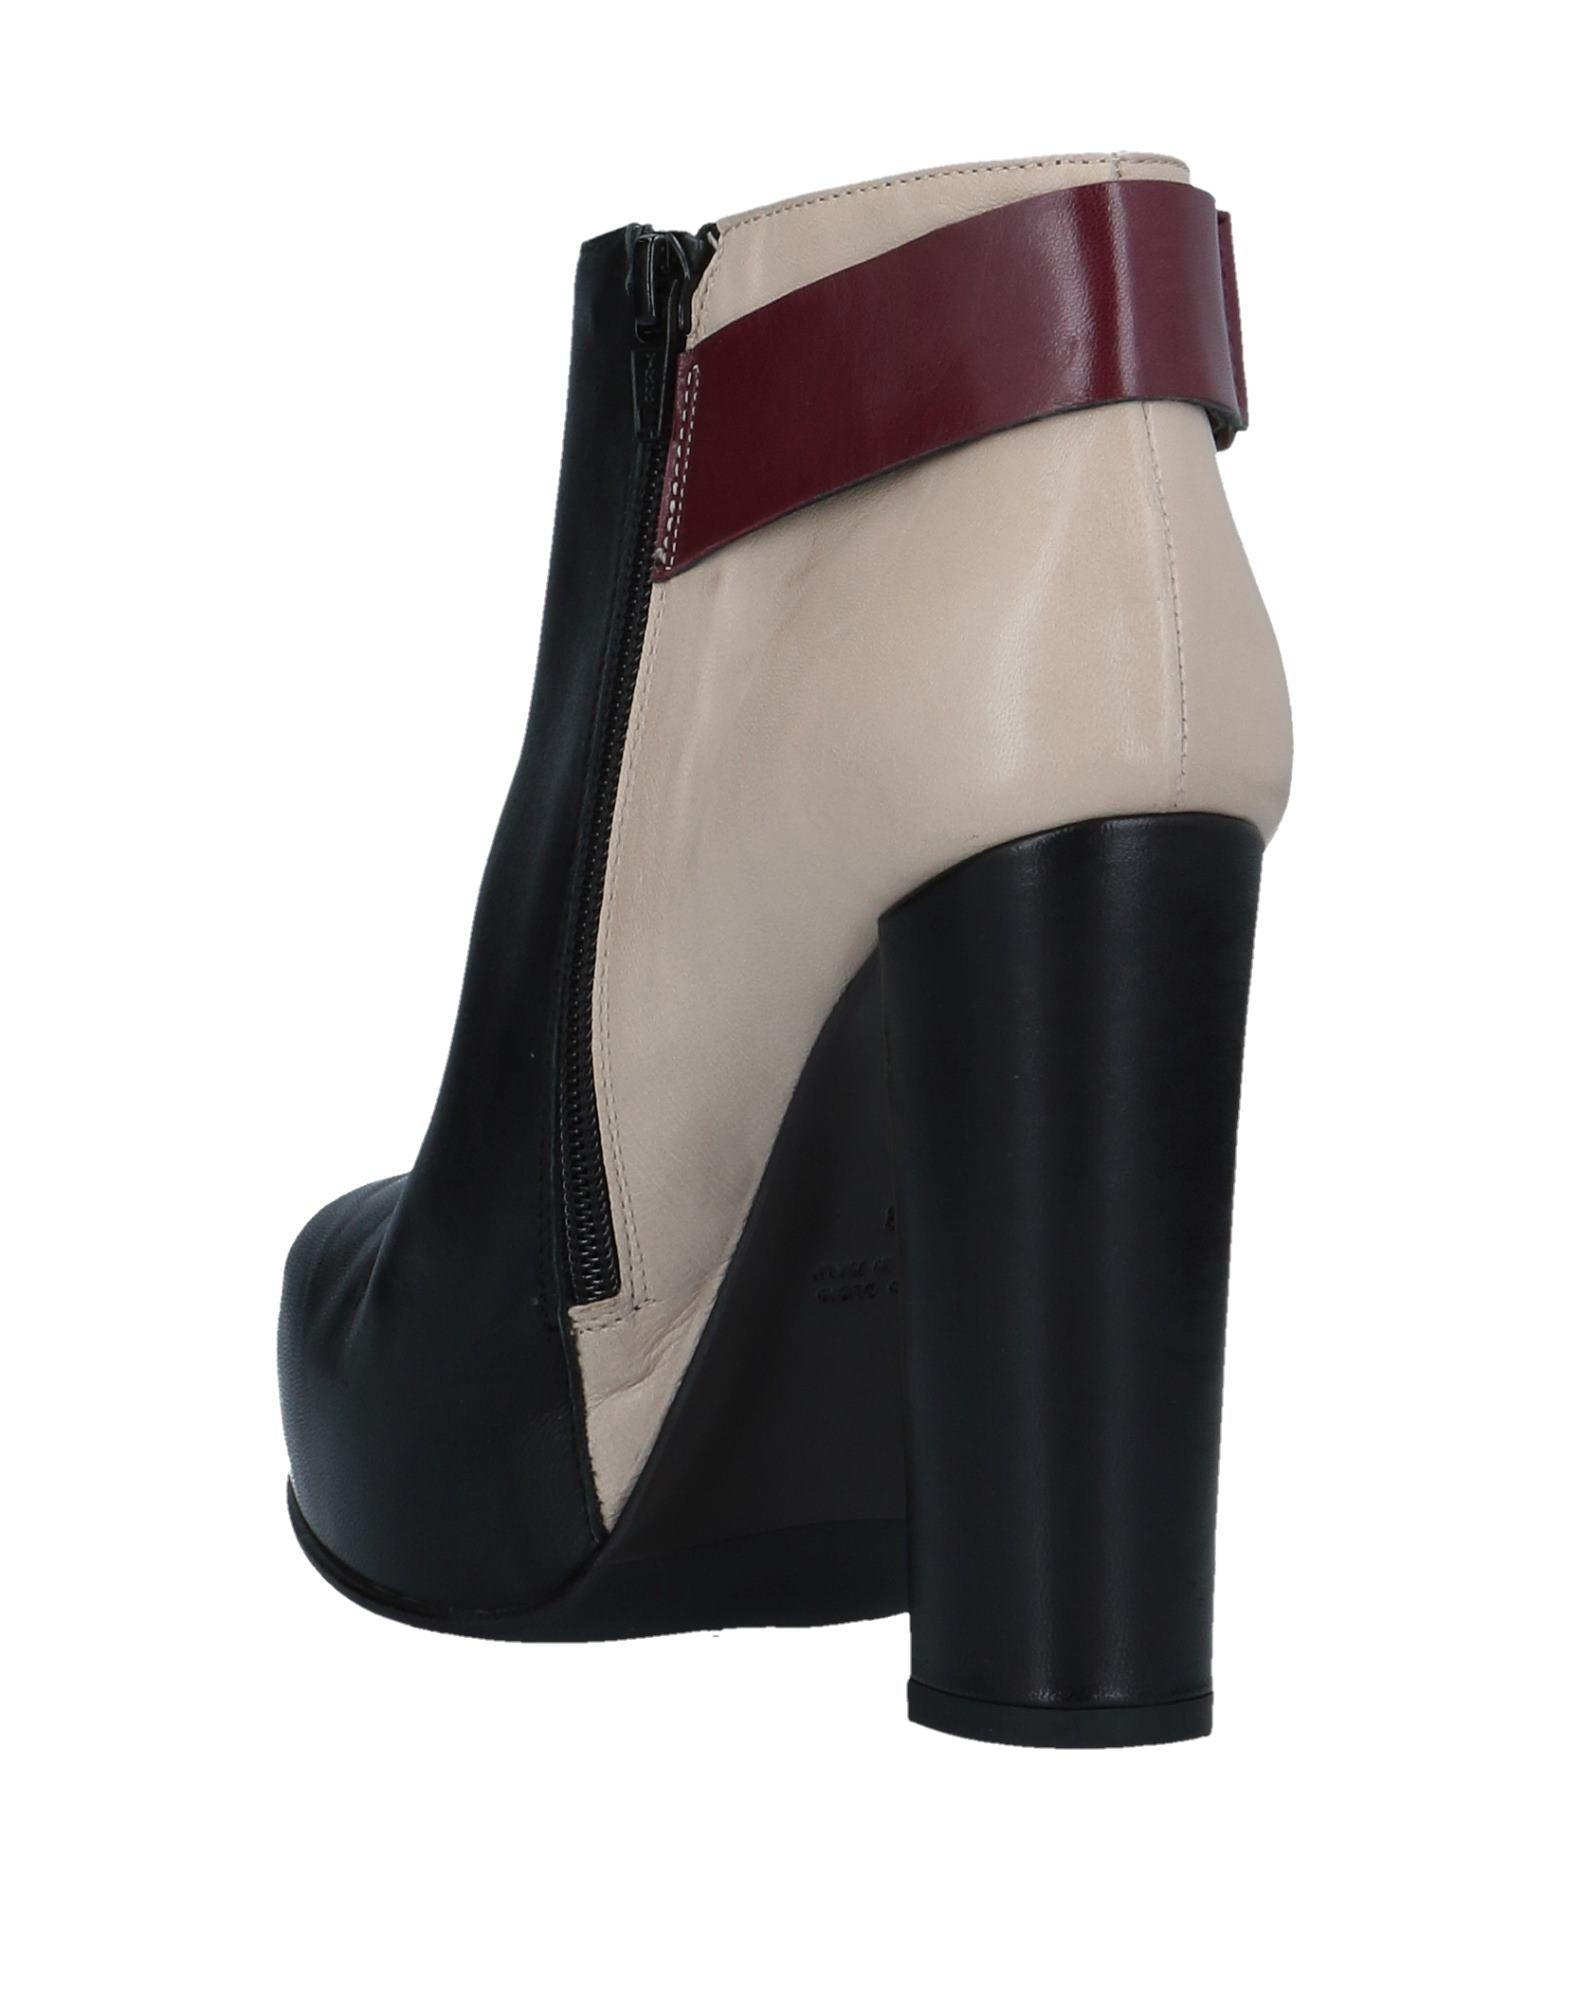 Stilvolle billige Stiefelette Schuhe Islo Isabella Lorusso Stiefelette billige Damen  11530575RO 7fd685